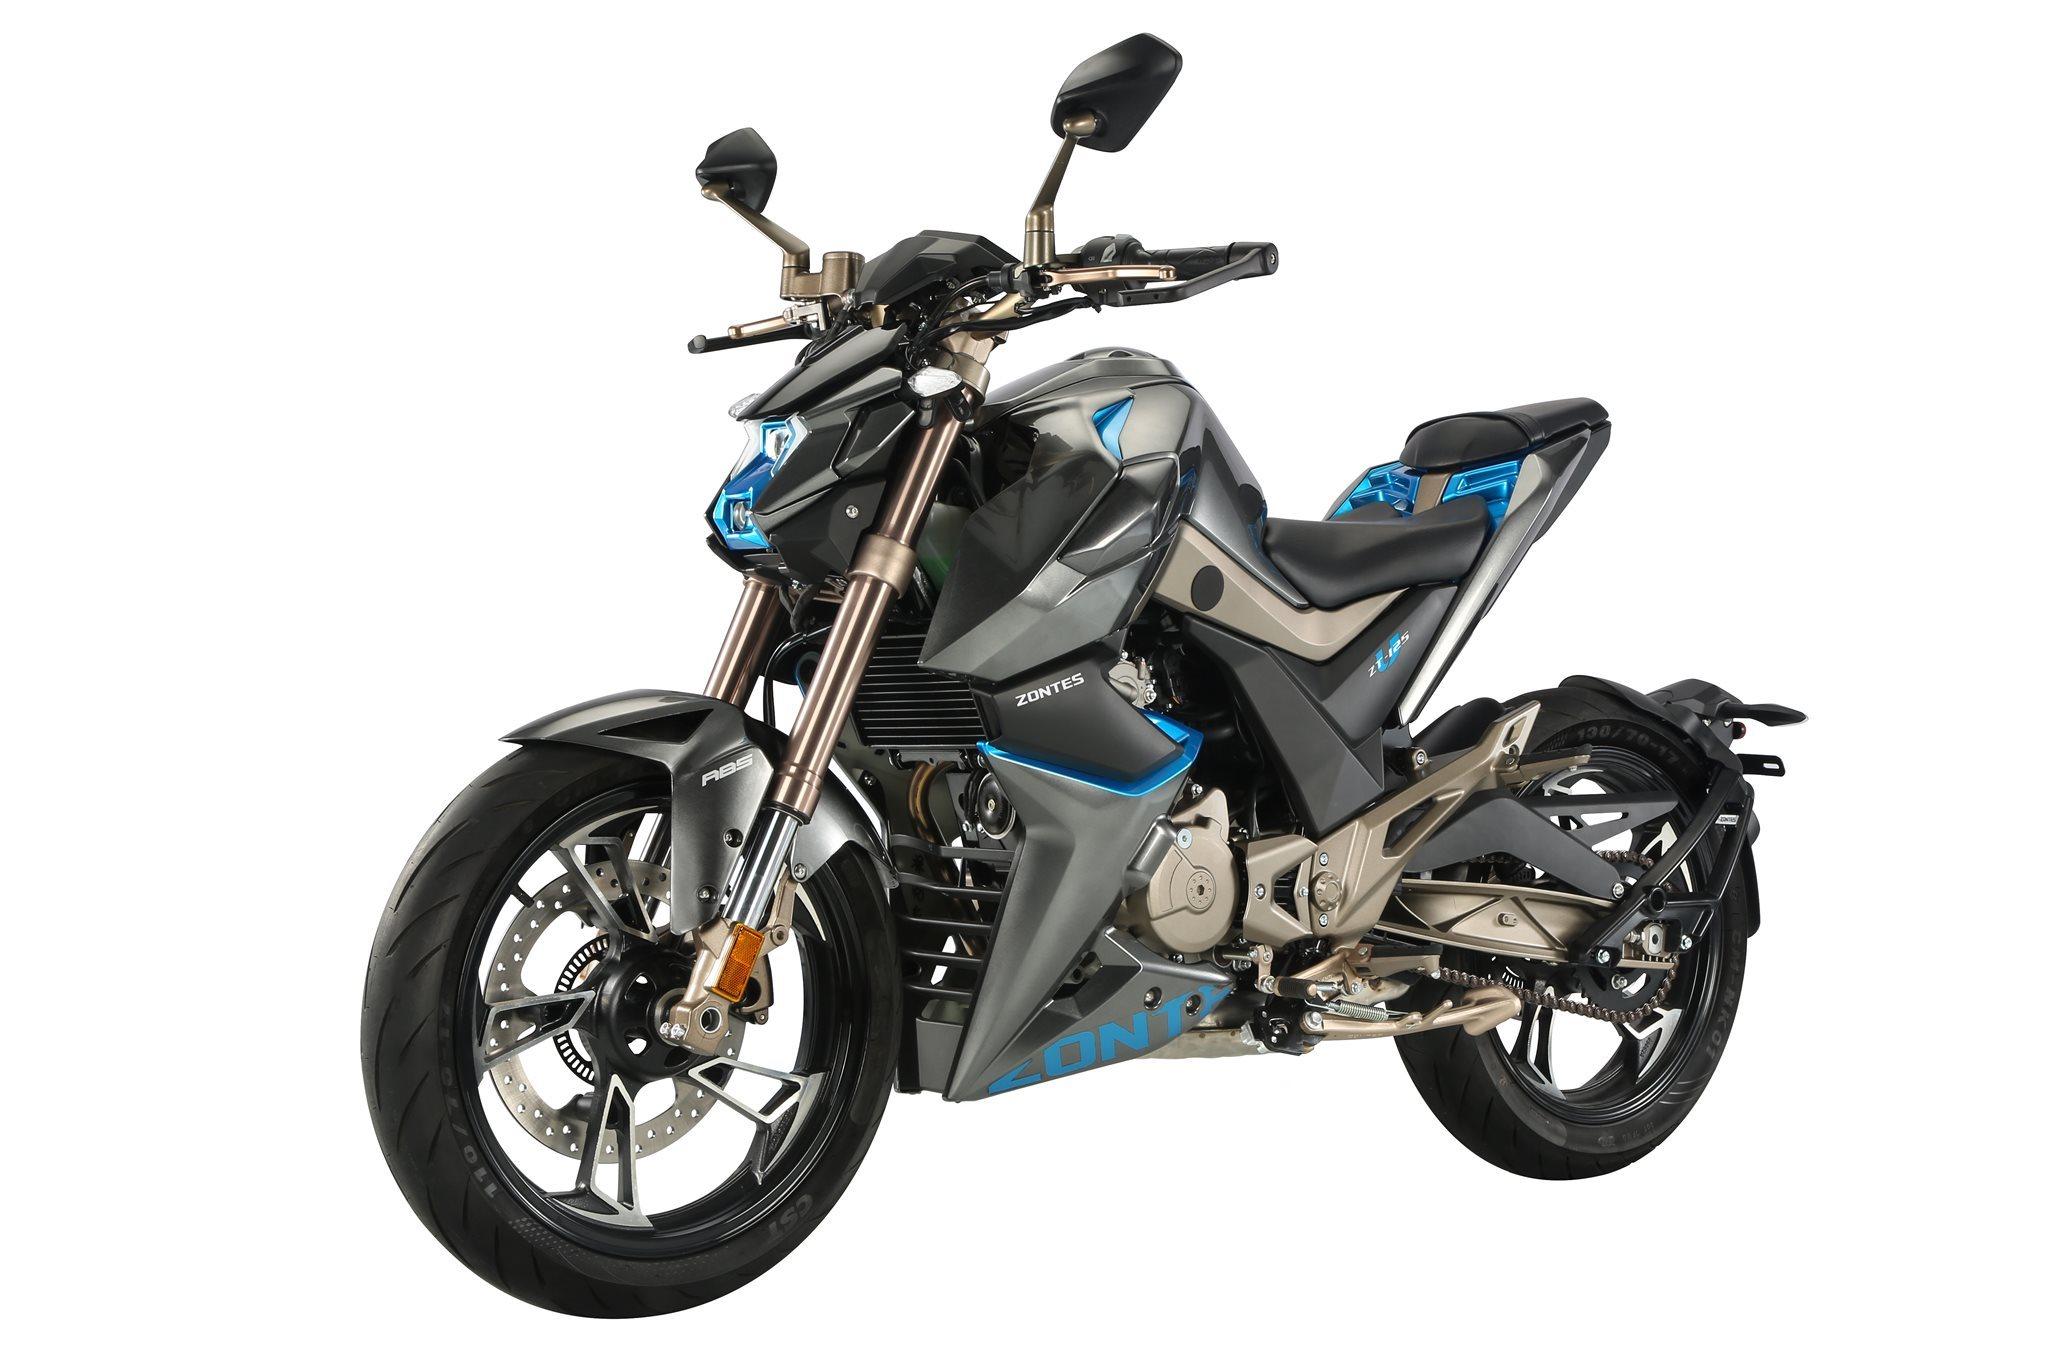 Neumotorrad: Zontes ZT 125-G1, Baujahr: 2021, 2.999,00 EUR